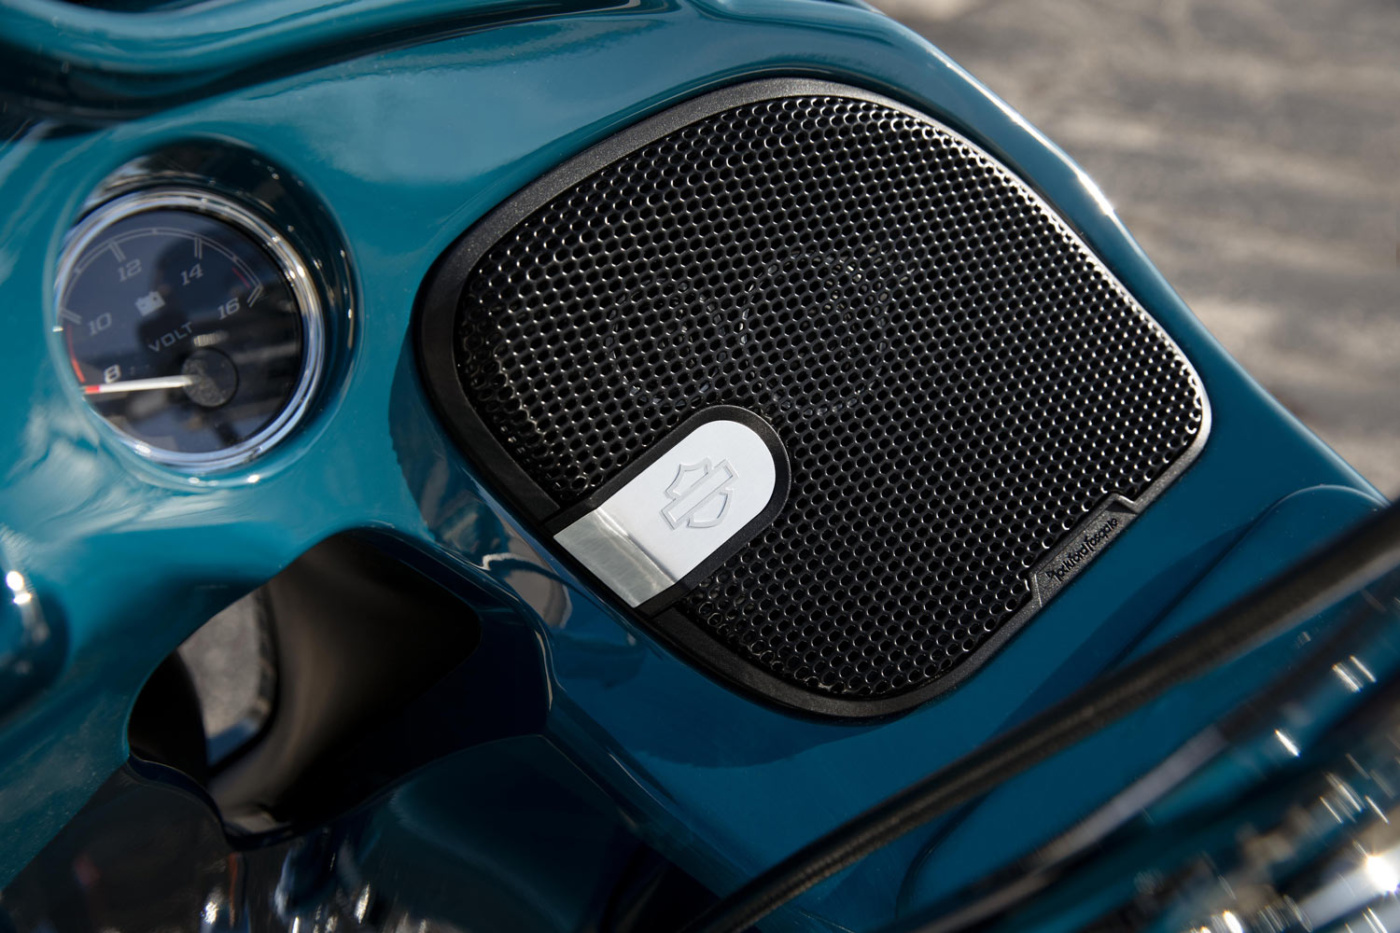 Harley-Davidson partnered with Rockford Fosgate 2 on audio system